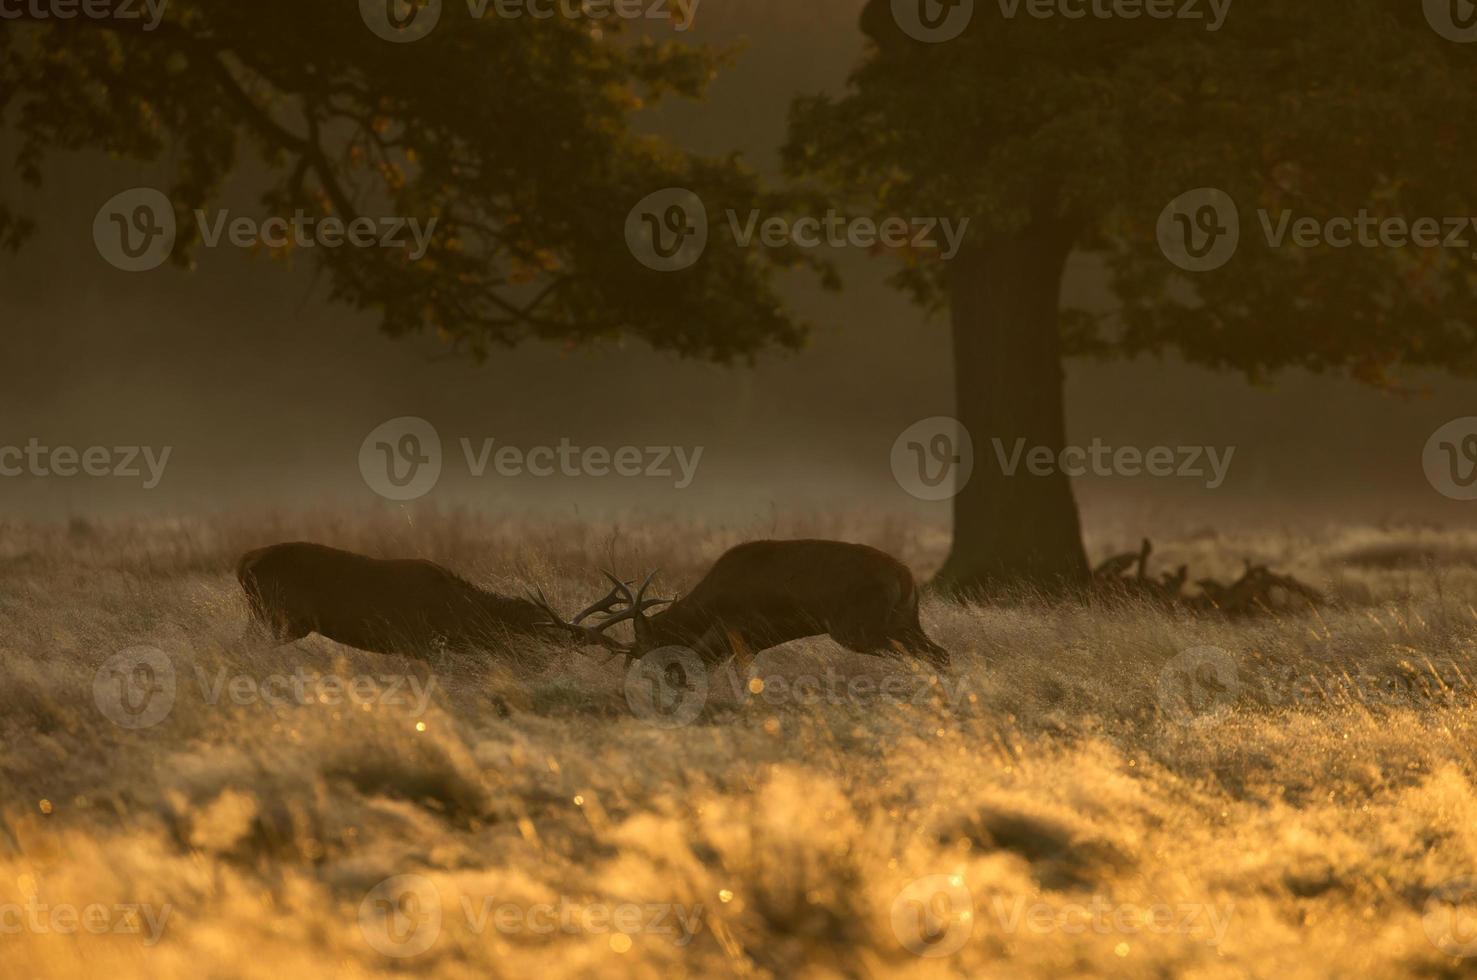 cervi rossi cervi combattendo foto